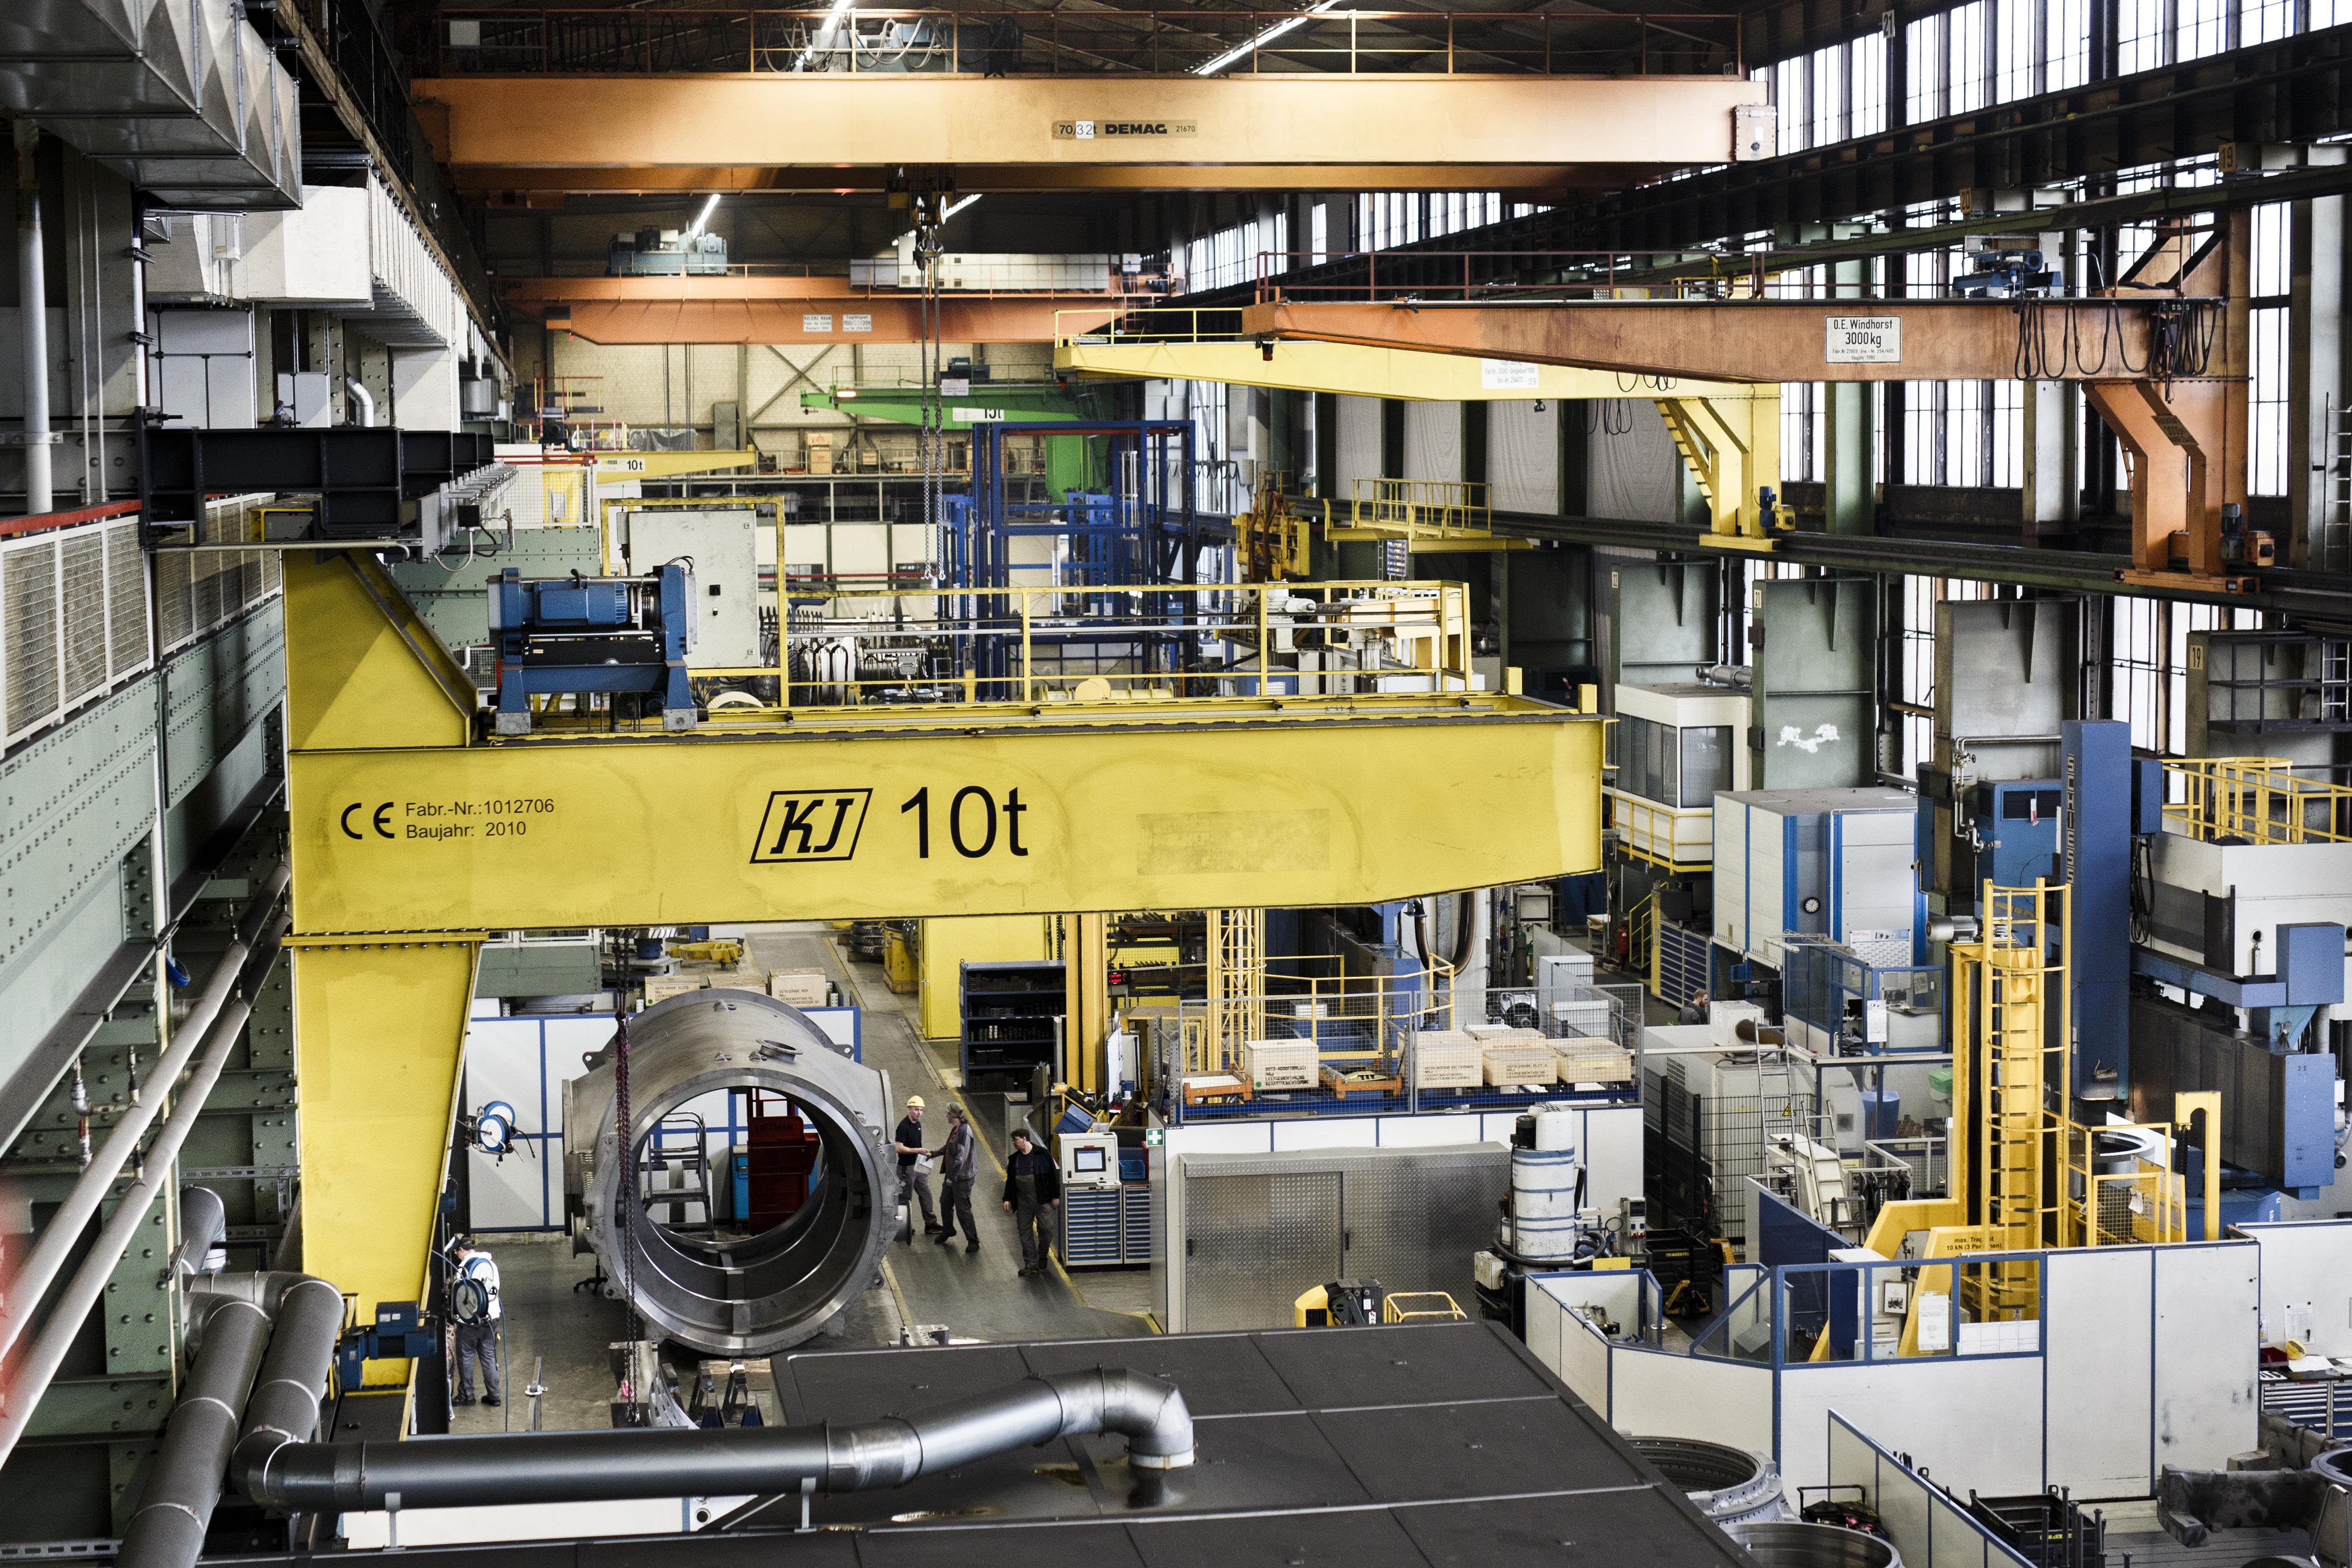 Sigmar Gabriel Visits Siemens Gas Turbine Factory